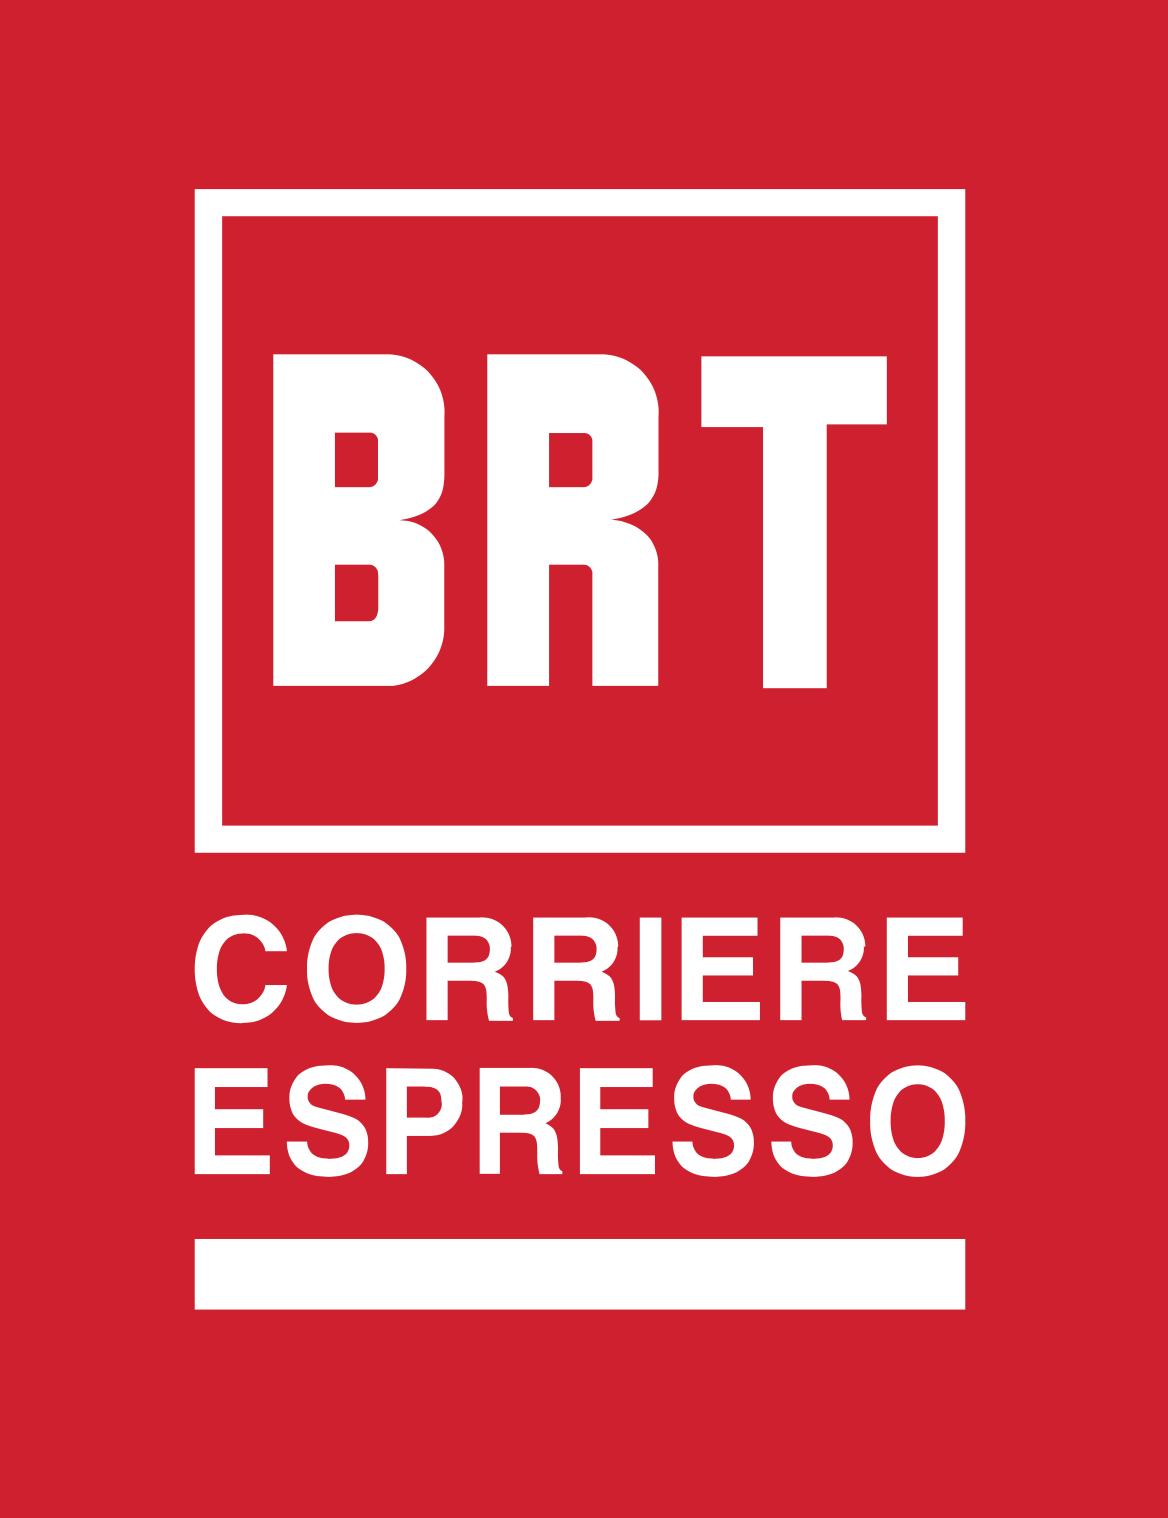 BRT corriere espresso